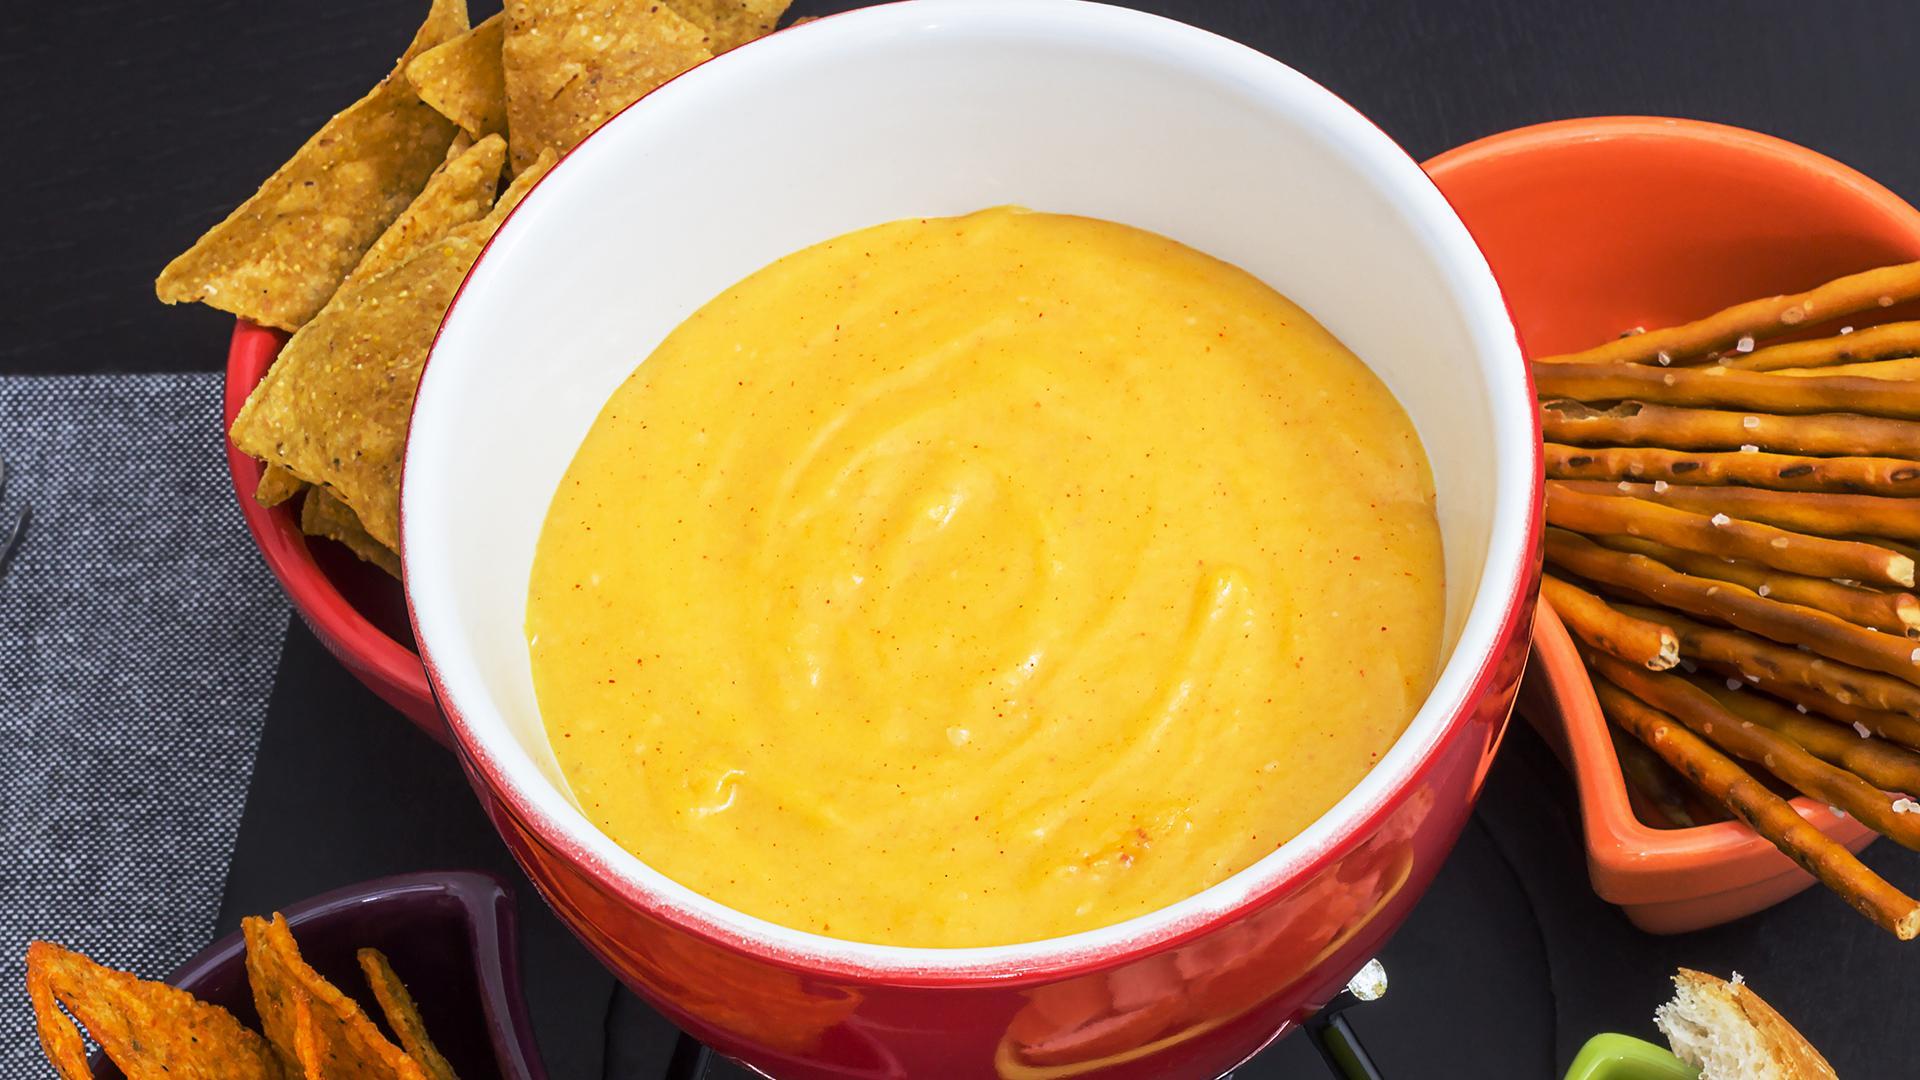 Cheddar Mustard Sauce